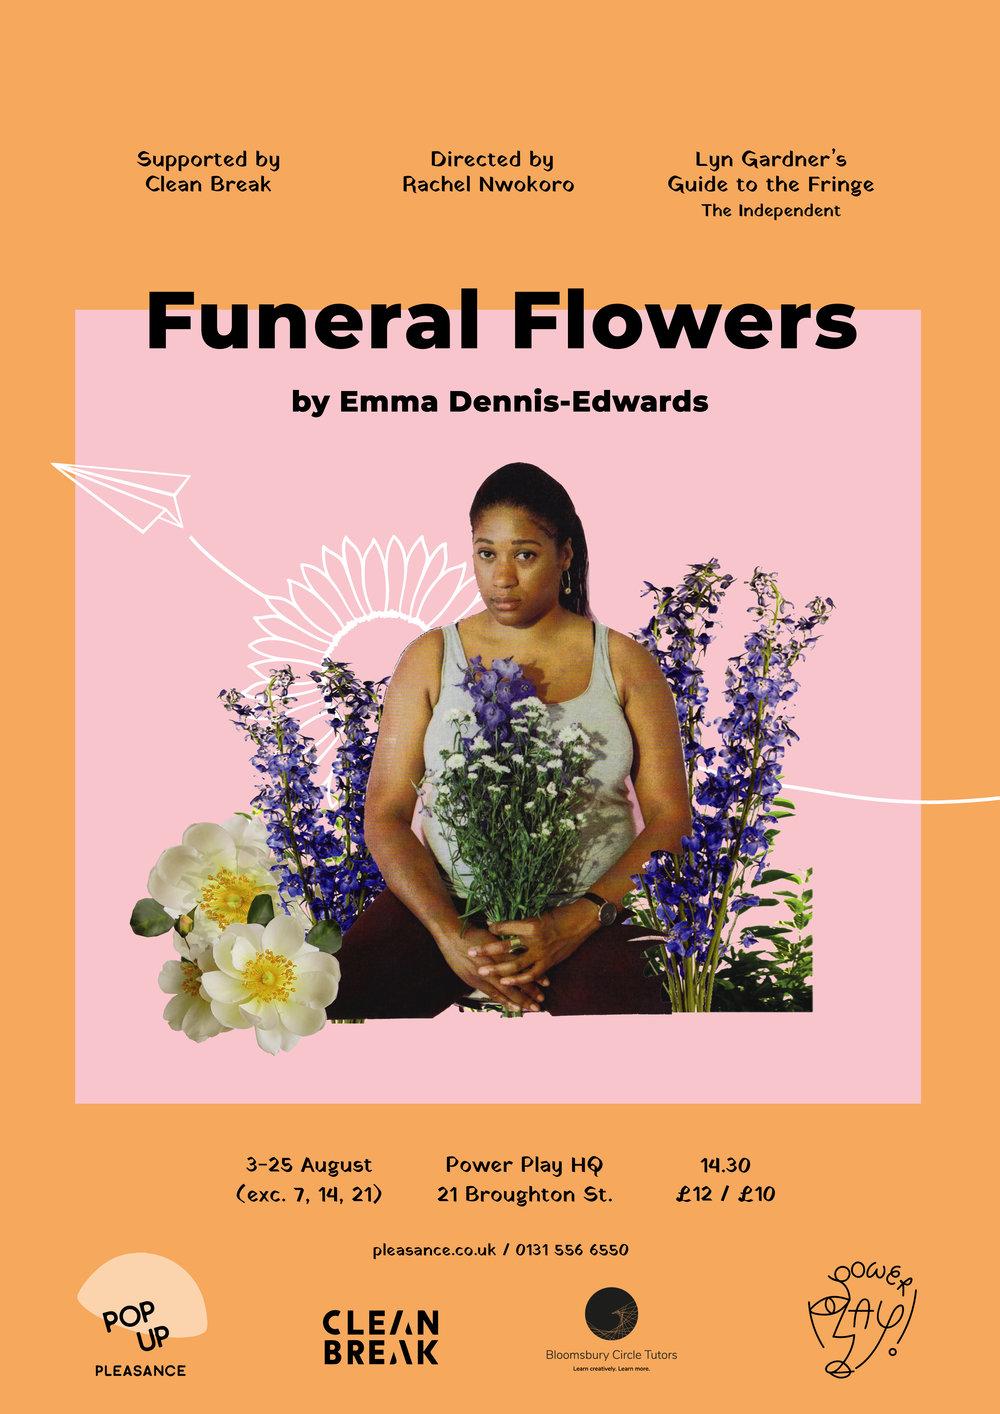 Power Play LW v007 Funeral Flowers.jpg